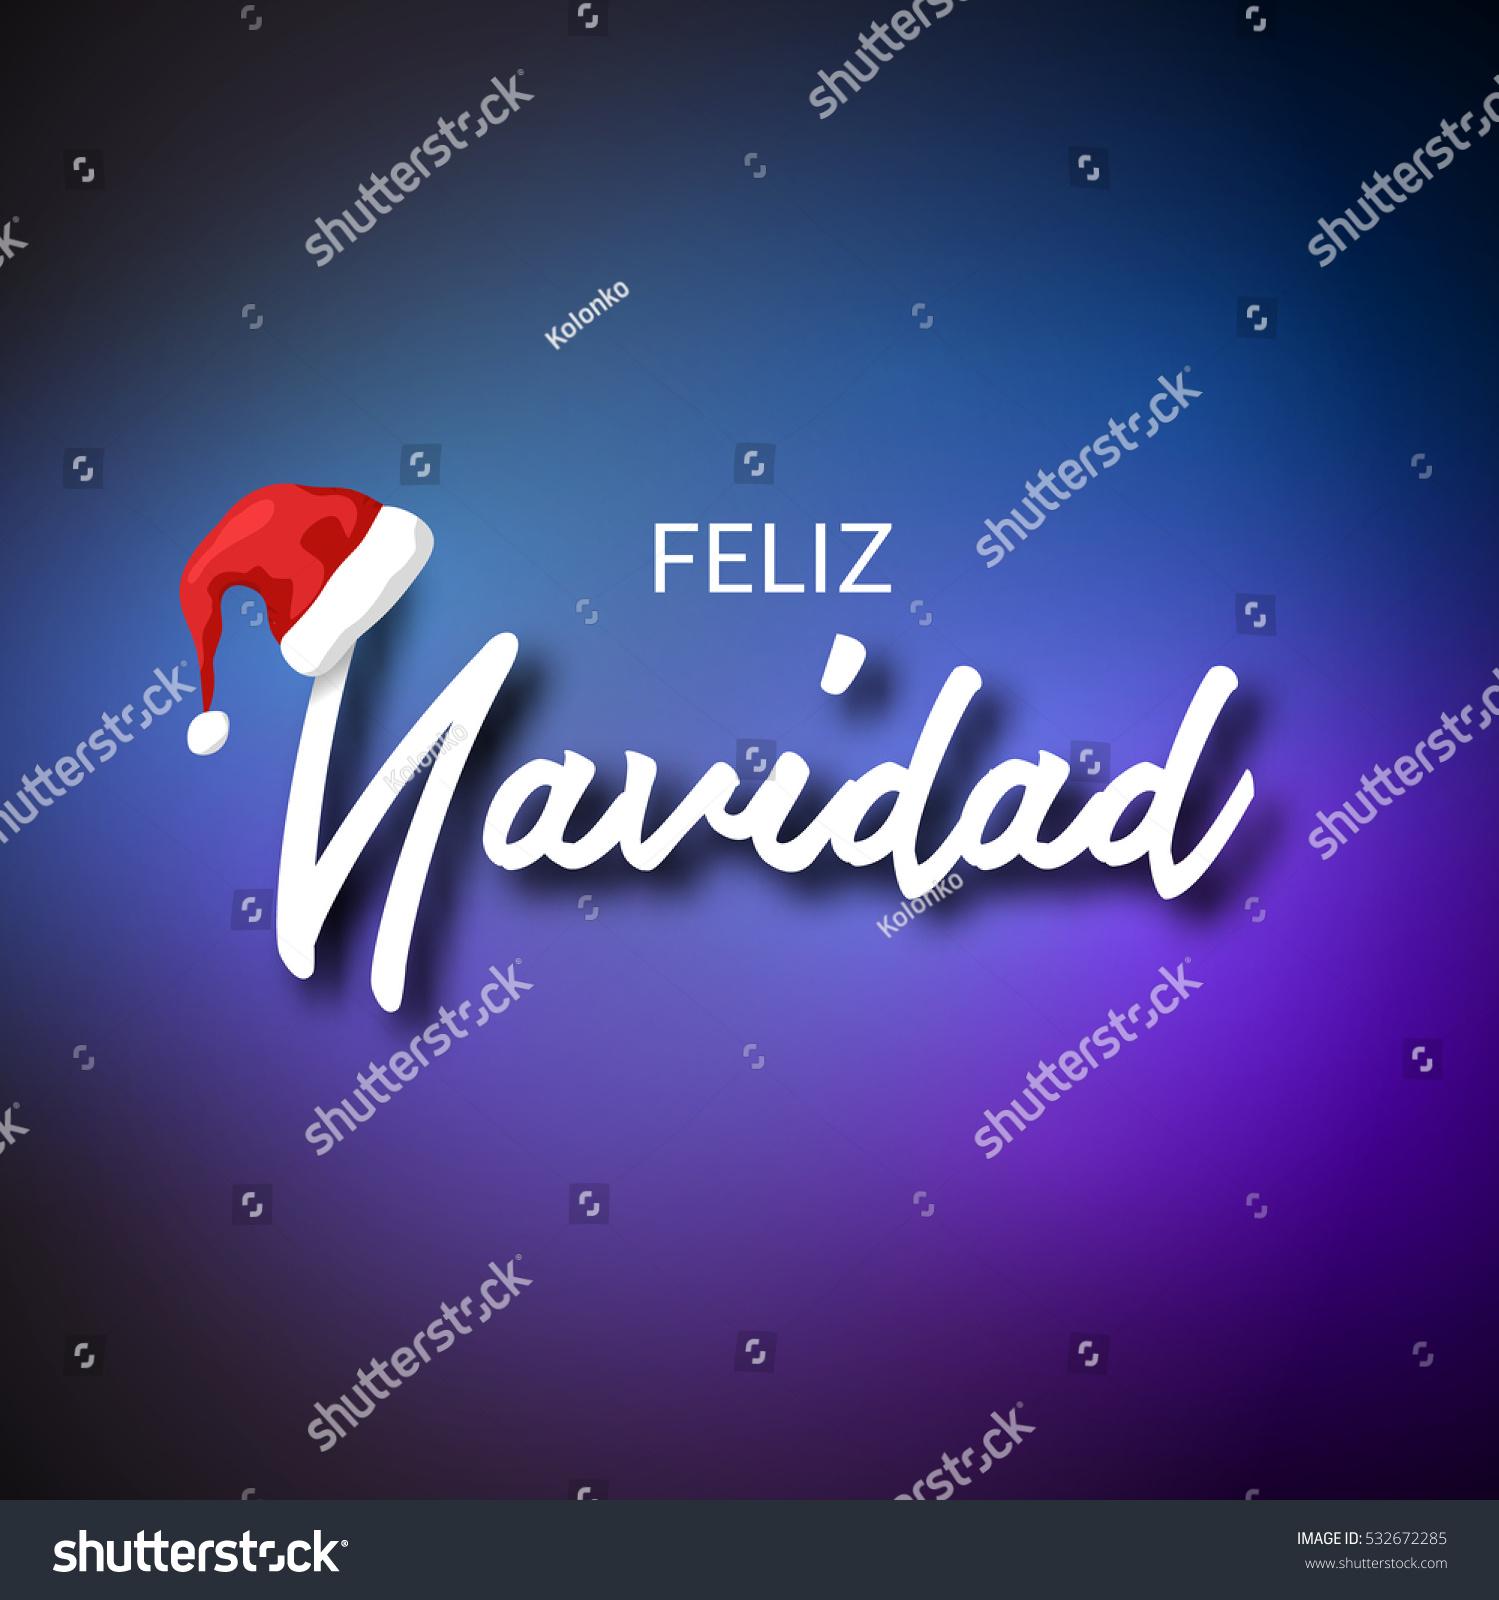 Feliz Navidad Merry Christmas Card Template Stock Vector (Royalty ...